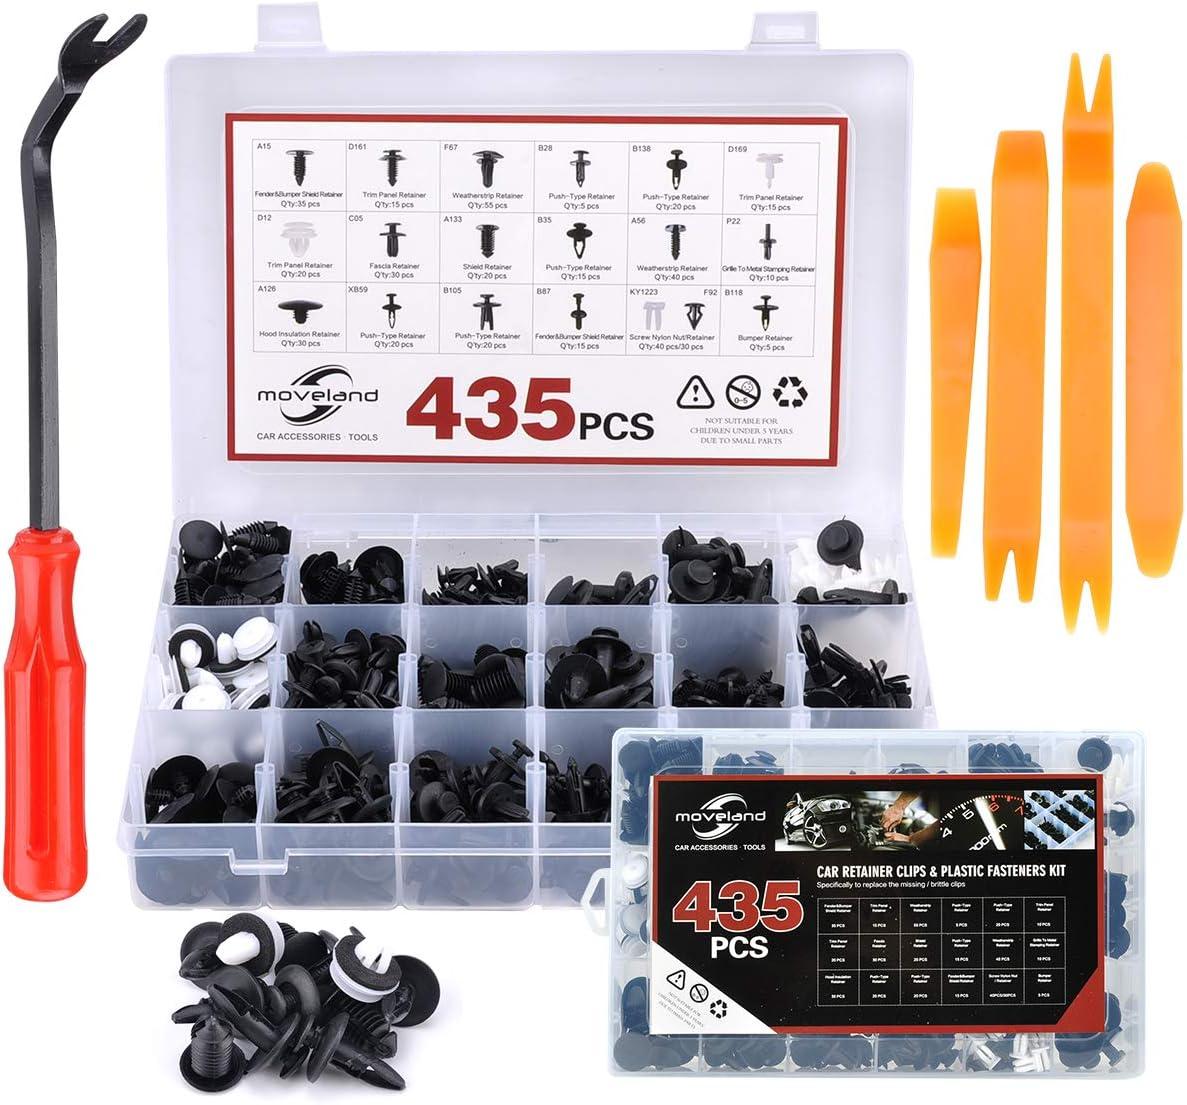 435PCS Bumper Car Retainer Clips & Plastic Fasteners Kit, Auto Push Pin Rivets Set for GM Ford Toyota Honda Chrysler Nissan